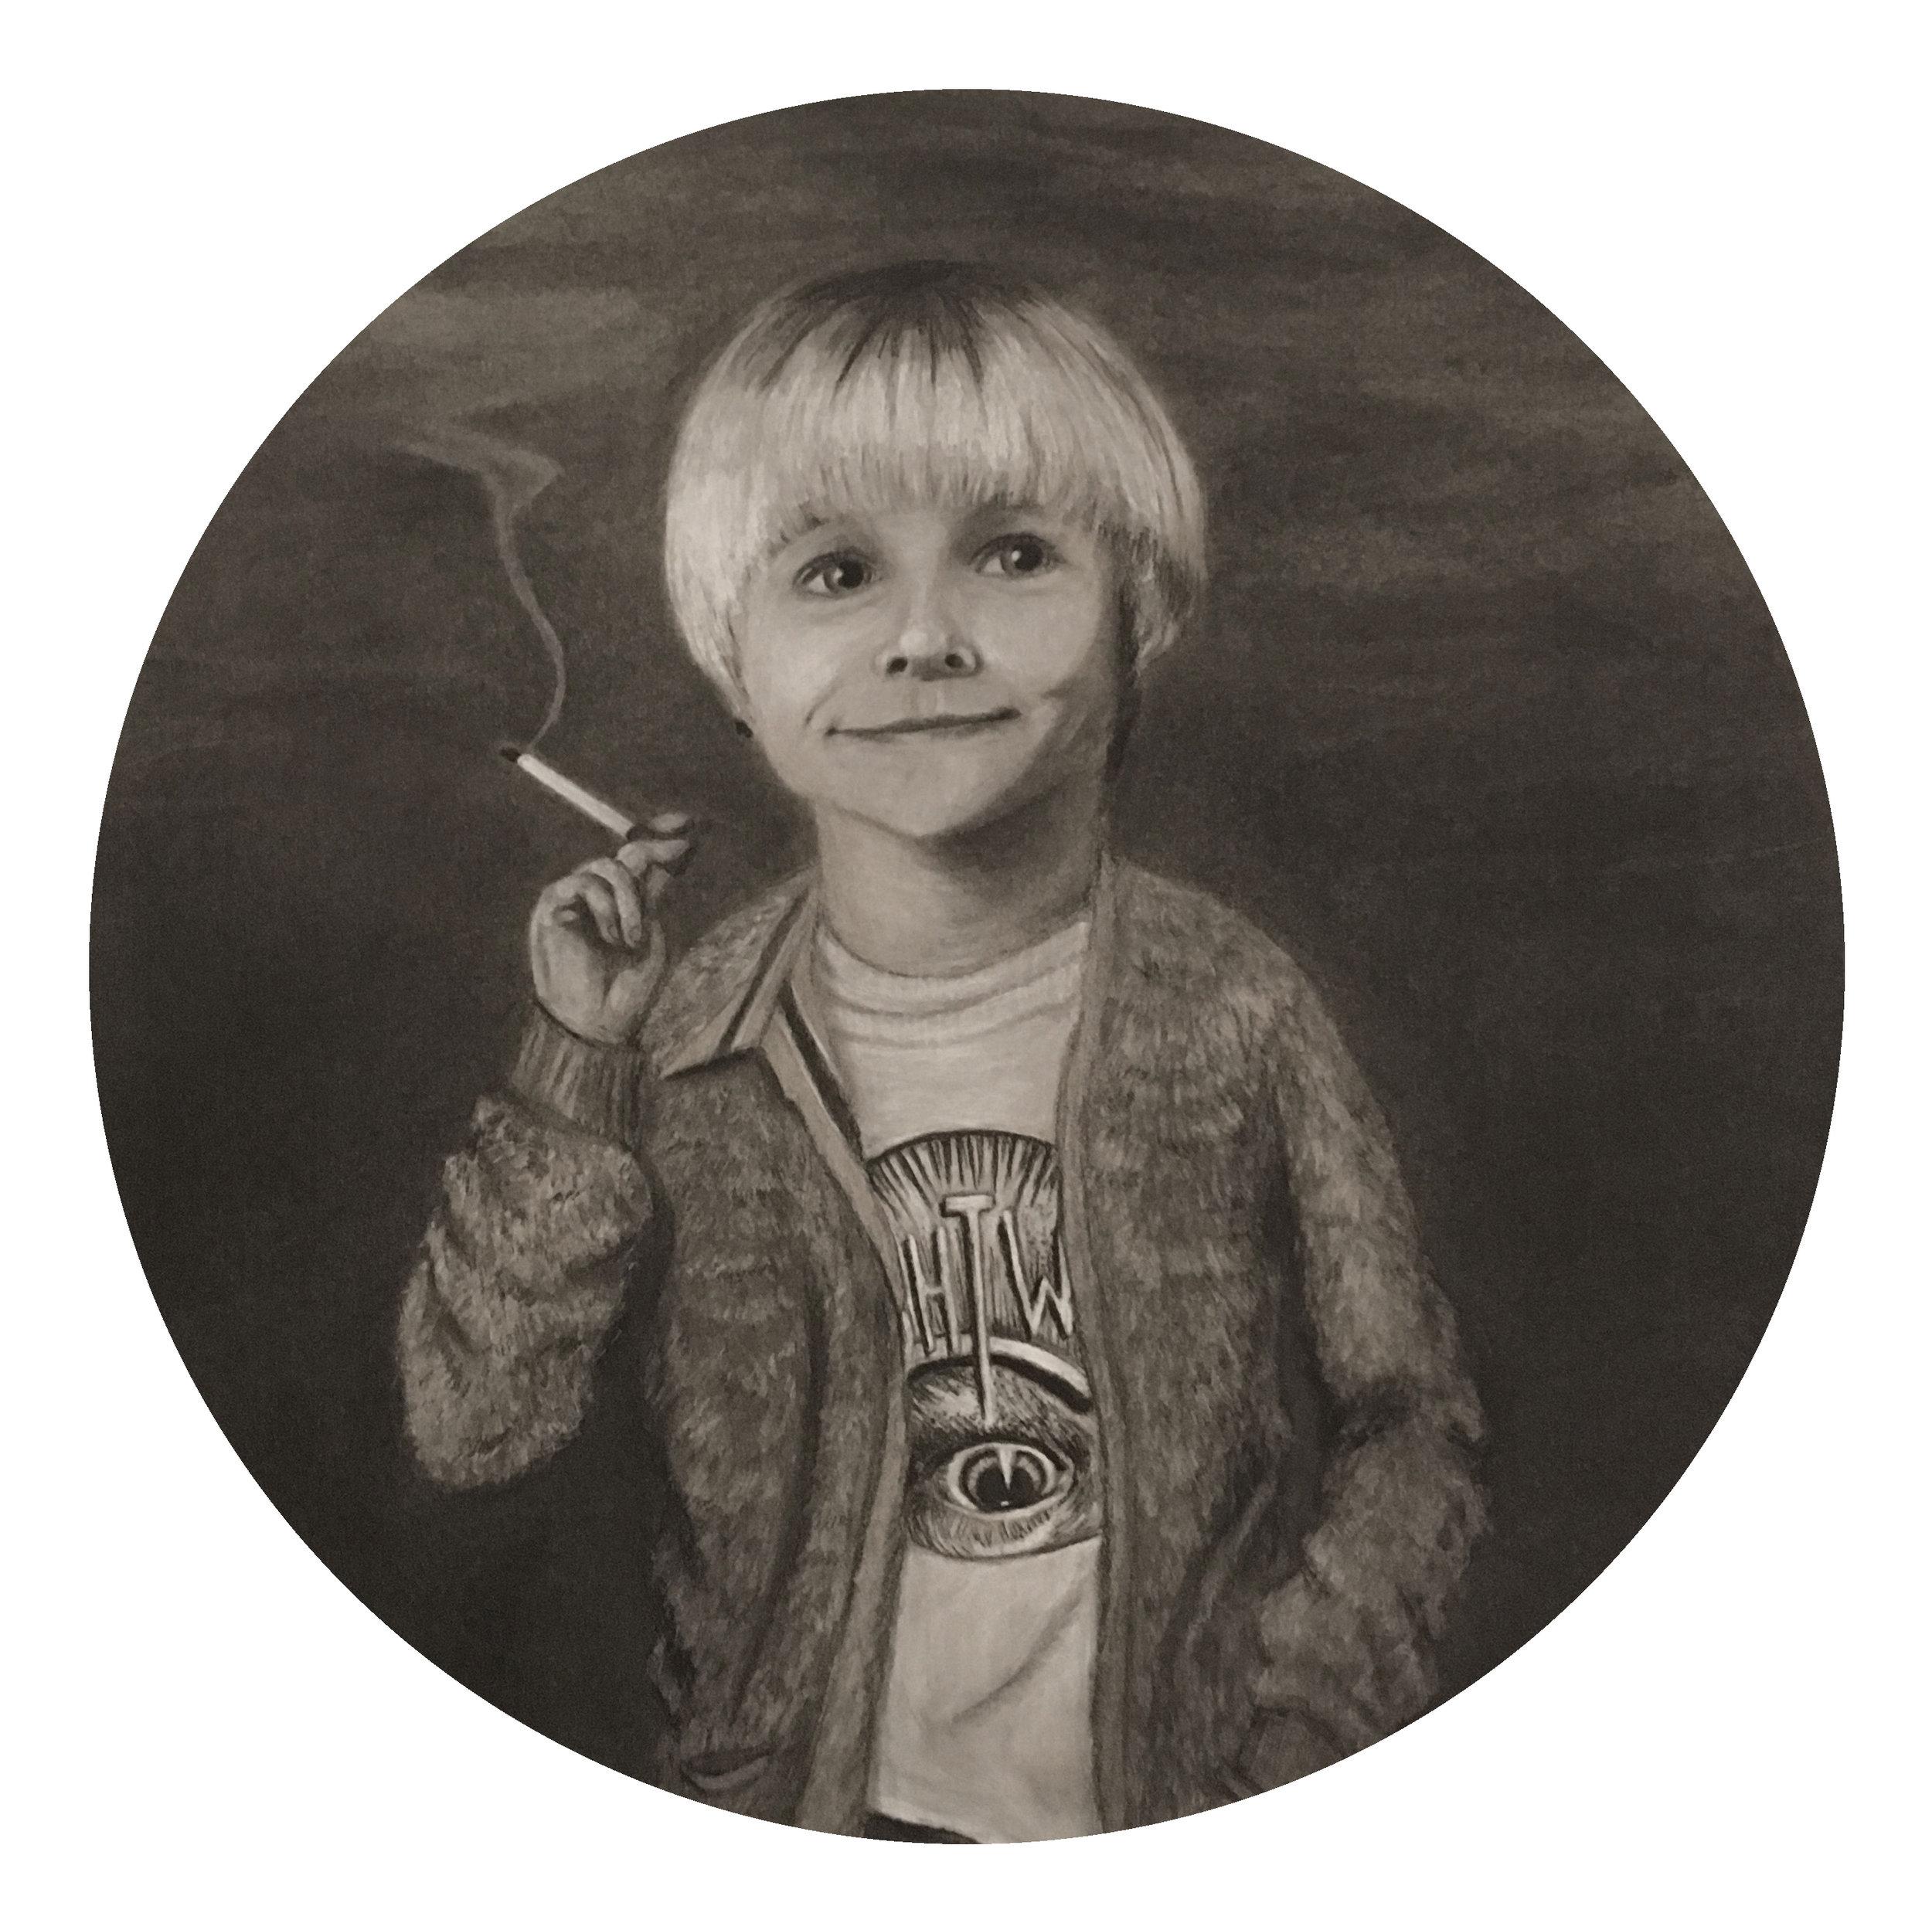 CobainAppropriation.jpg